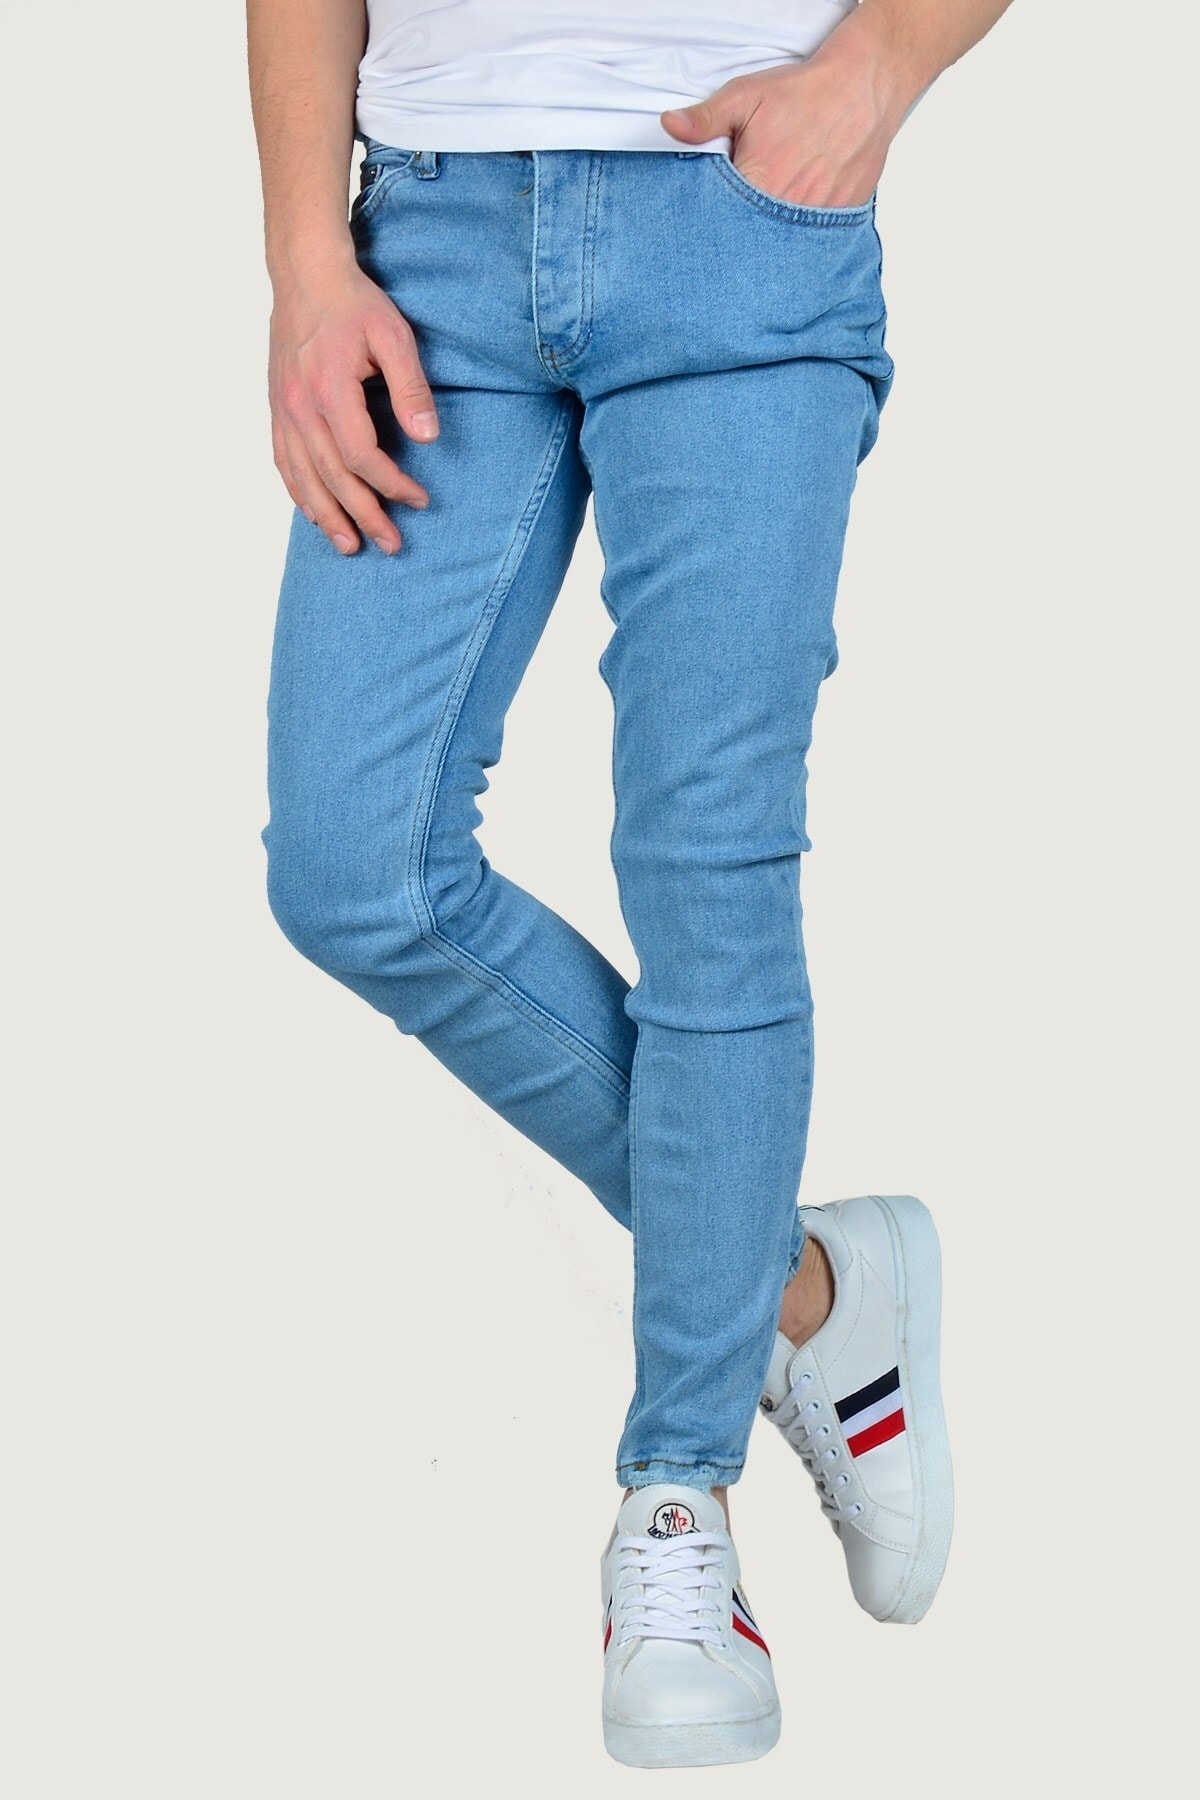 Terapi Men Erkek Kot Pantolon 8K-2100306-004-1 Buz Mavisi